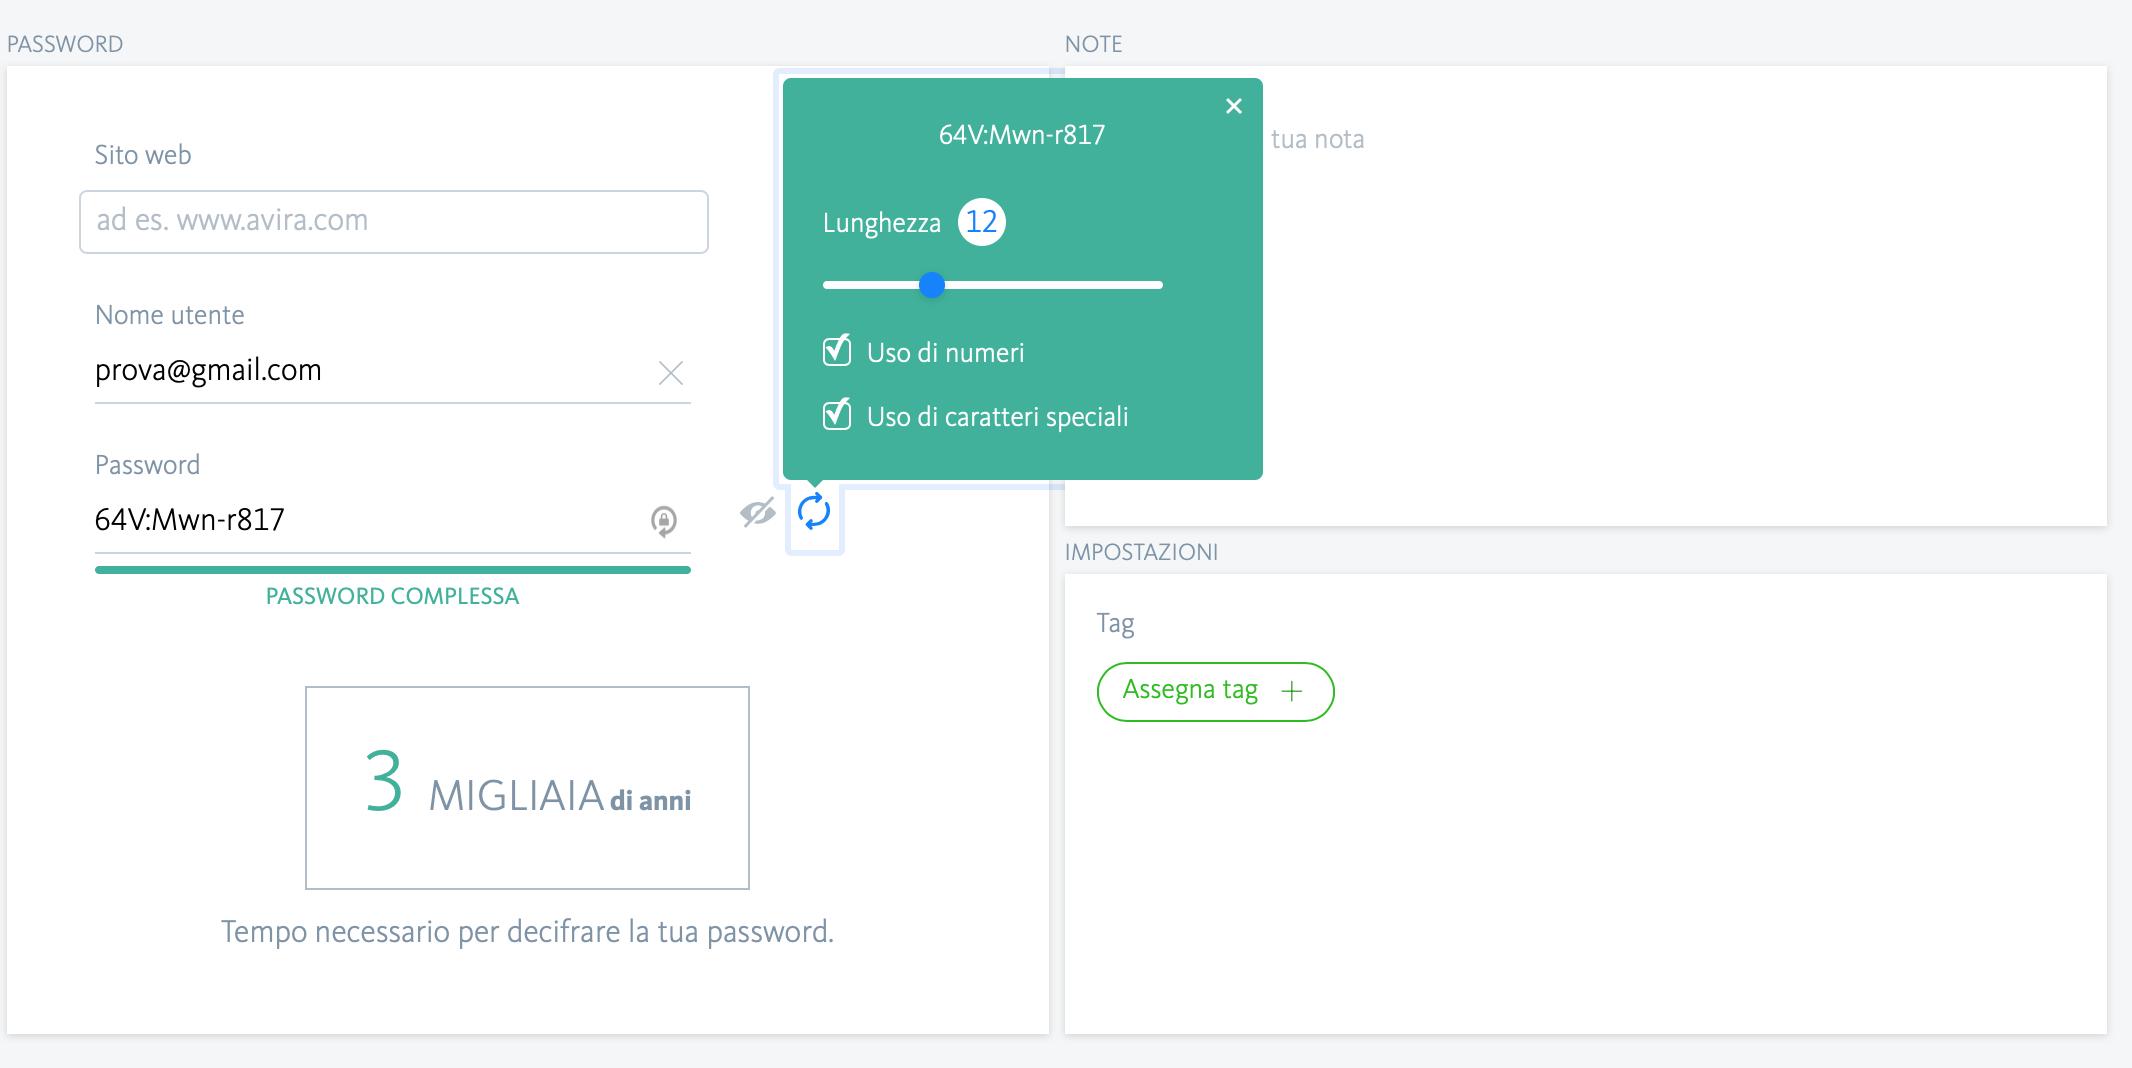 Recensione Avira Password Manager Pro, potete benissimo scordarvi tutte le password 1